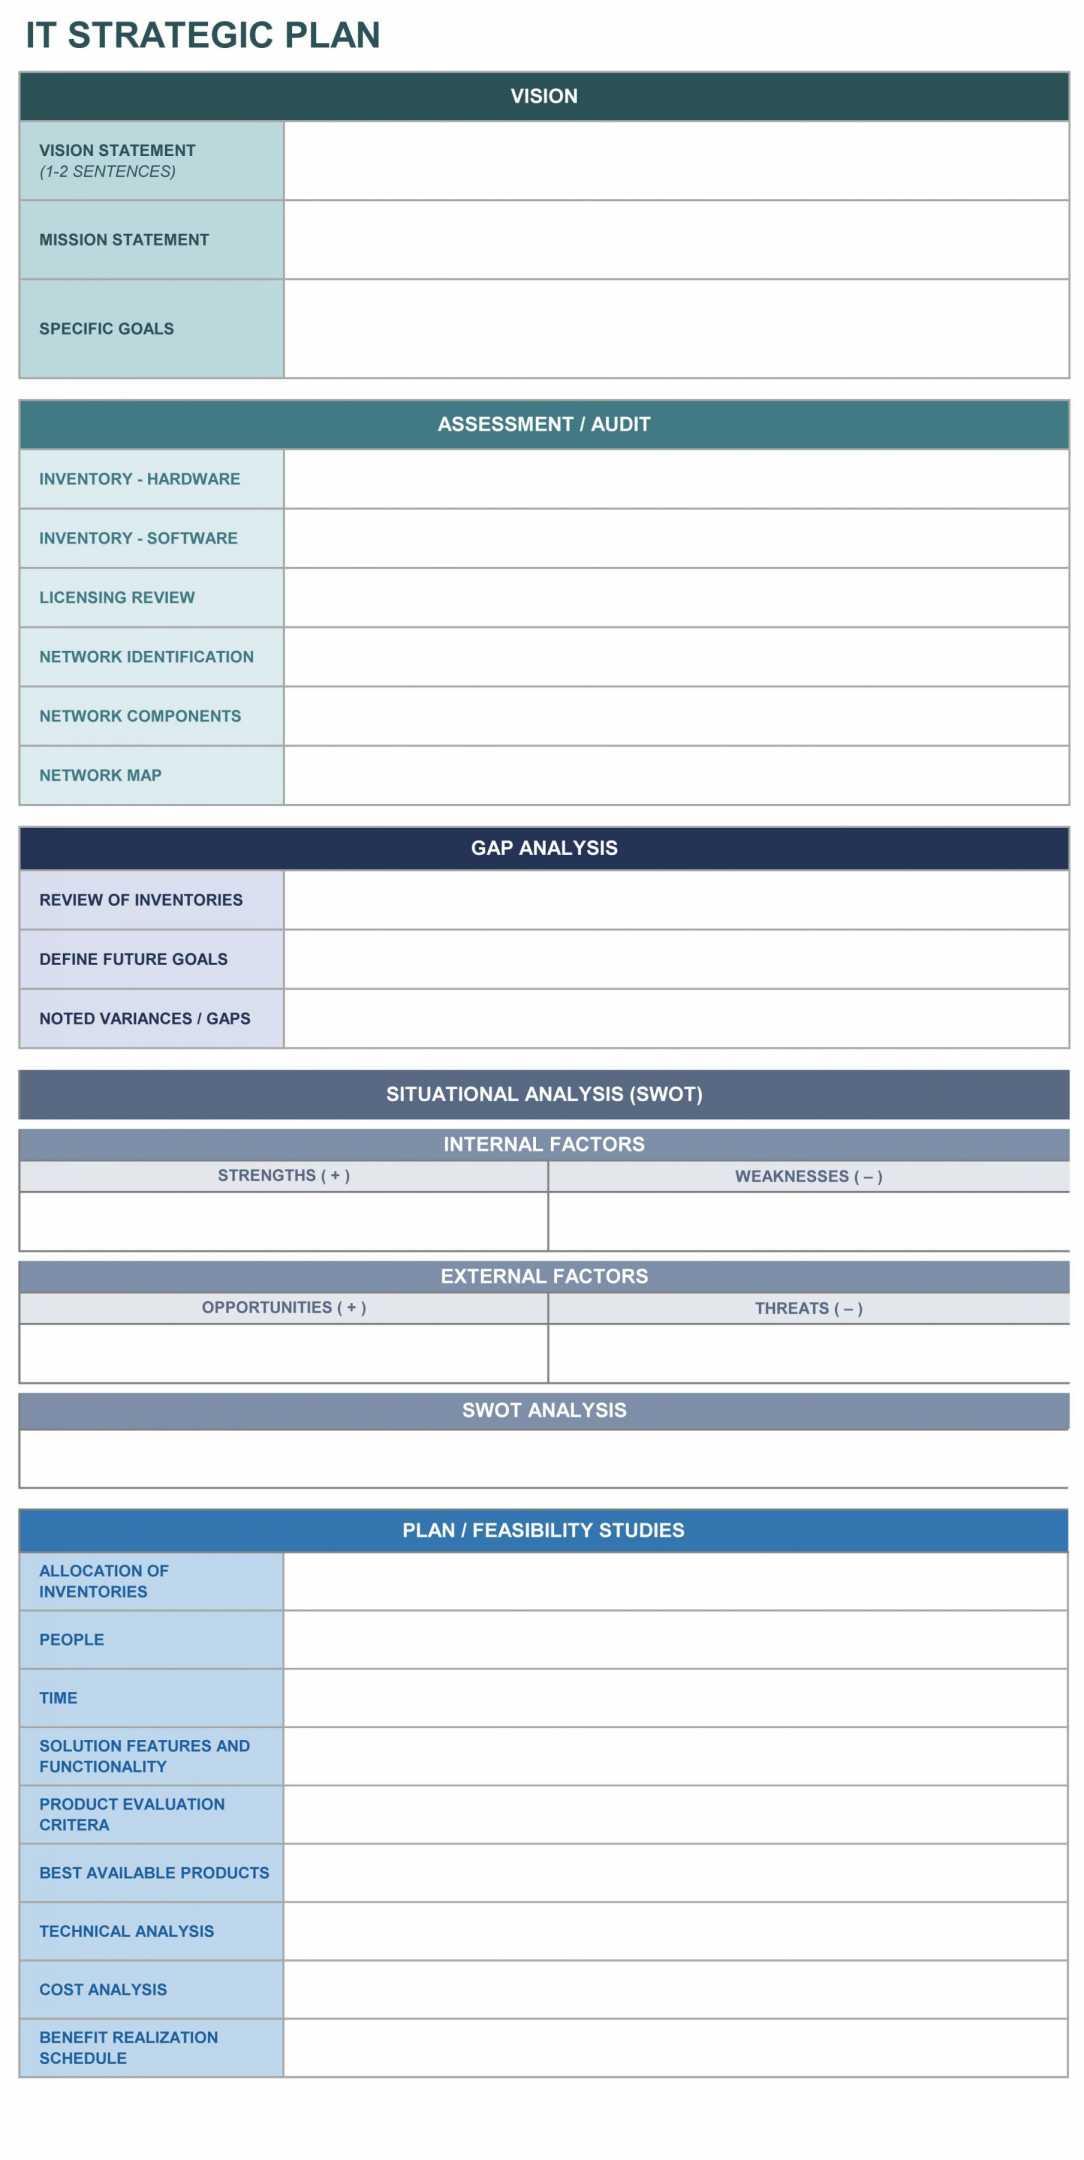 Retirement Planning Spreadsheet Templates Fresh Tolerance Analysis with Spreadsheet For Retirement Planning